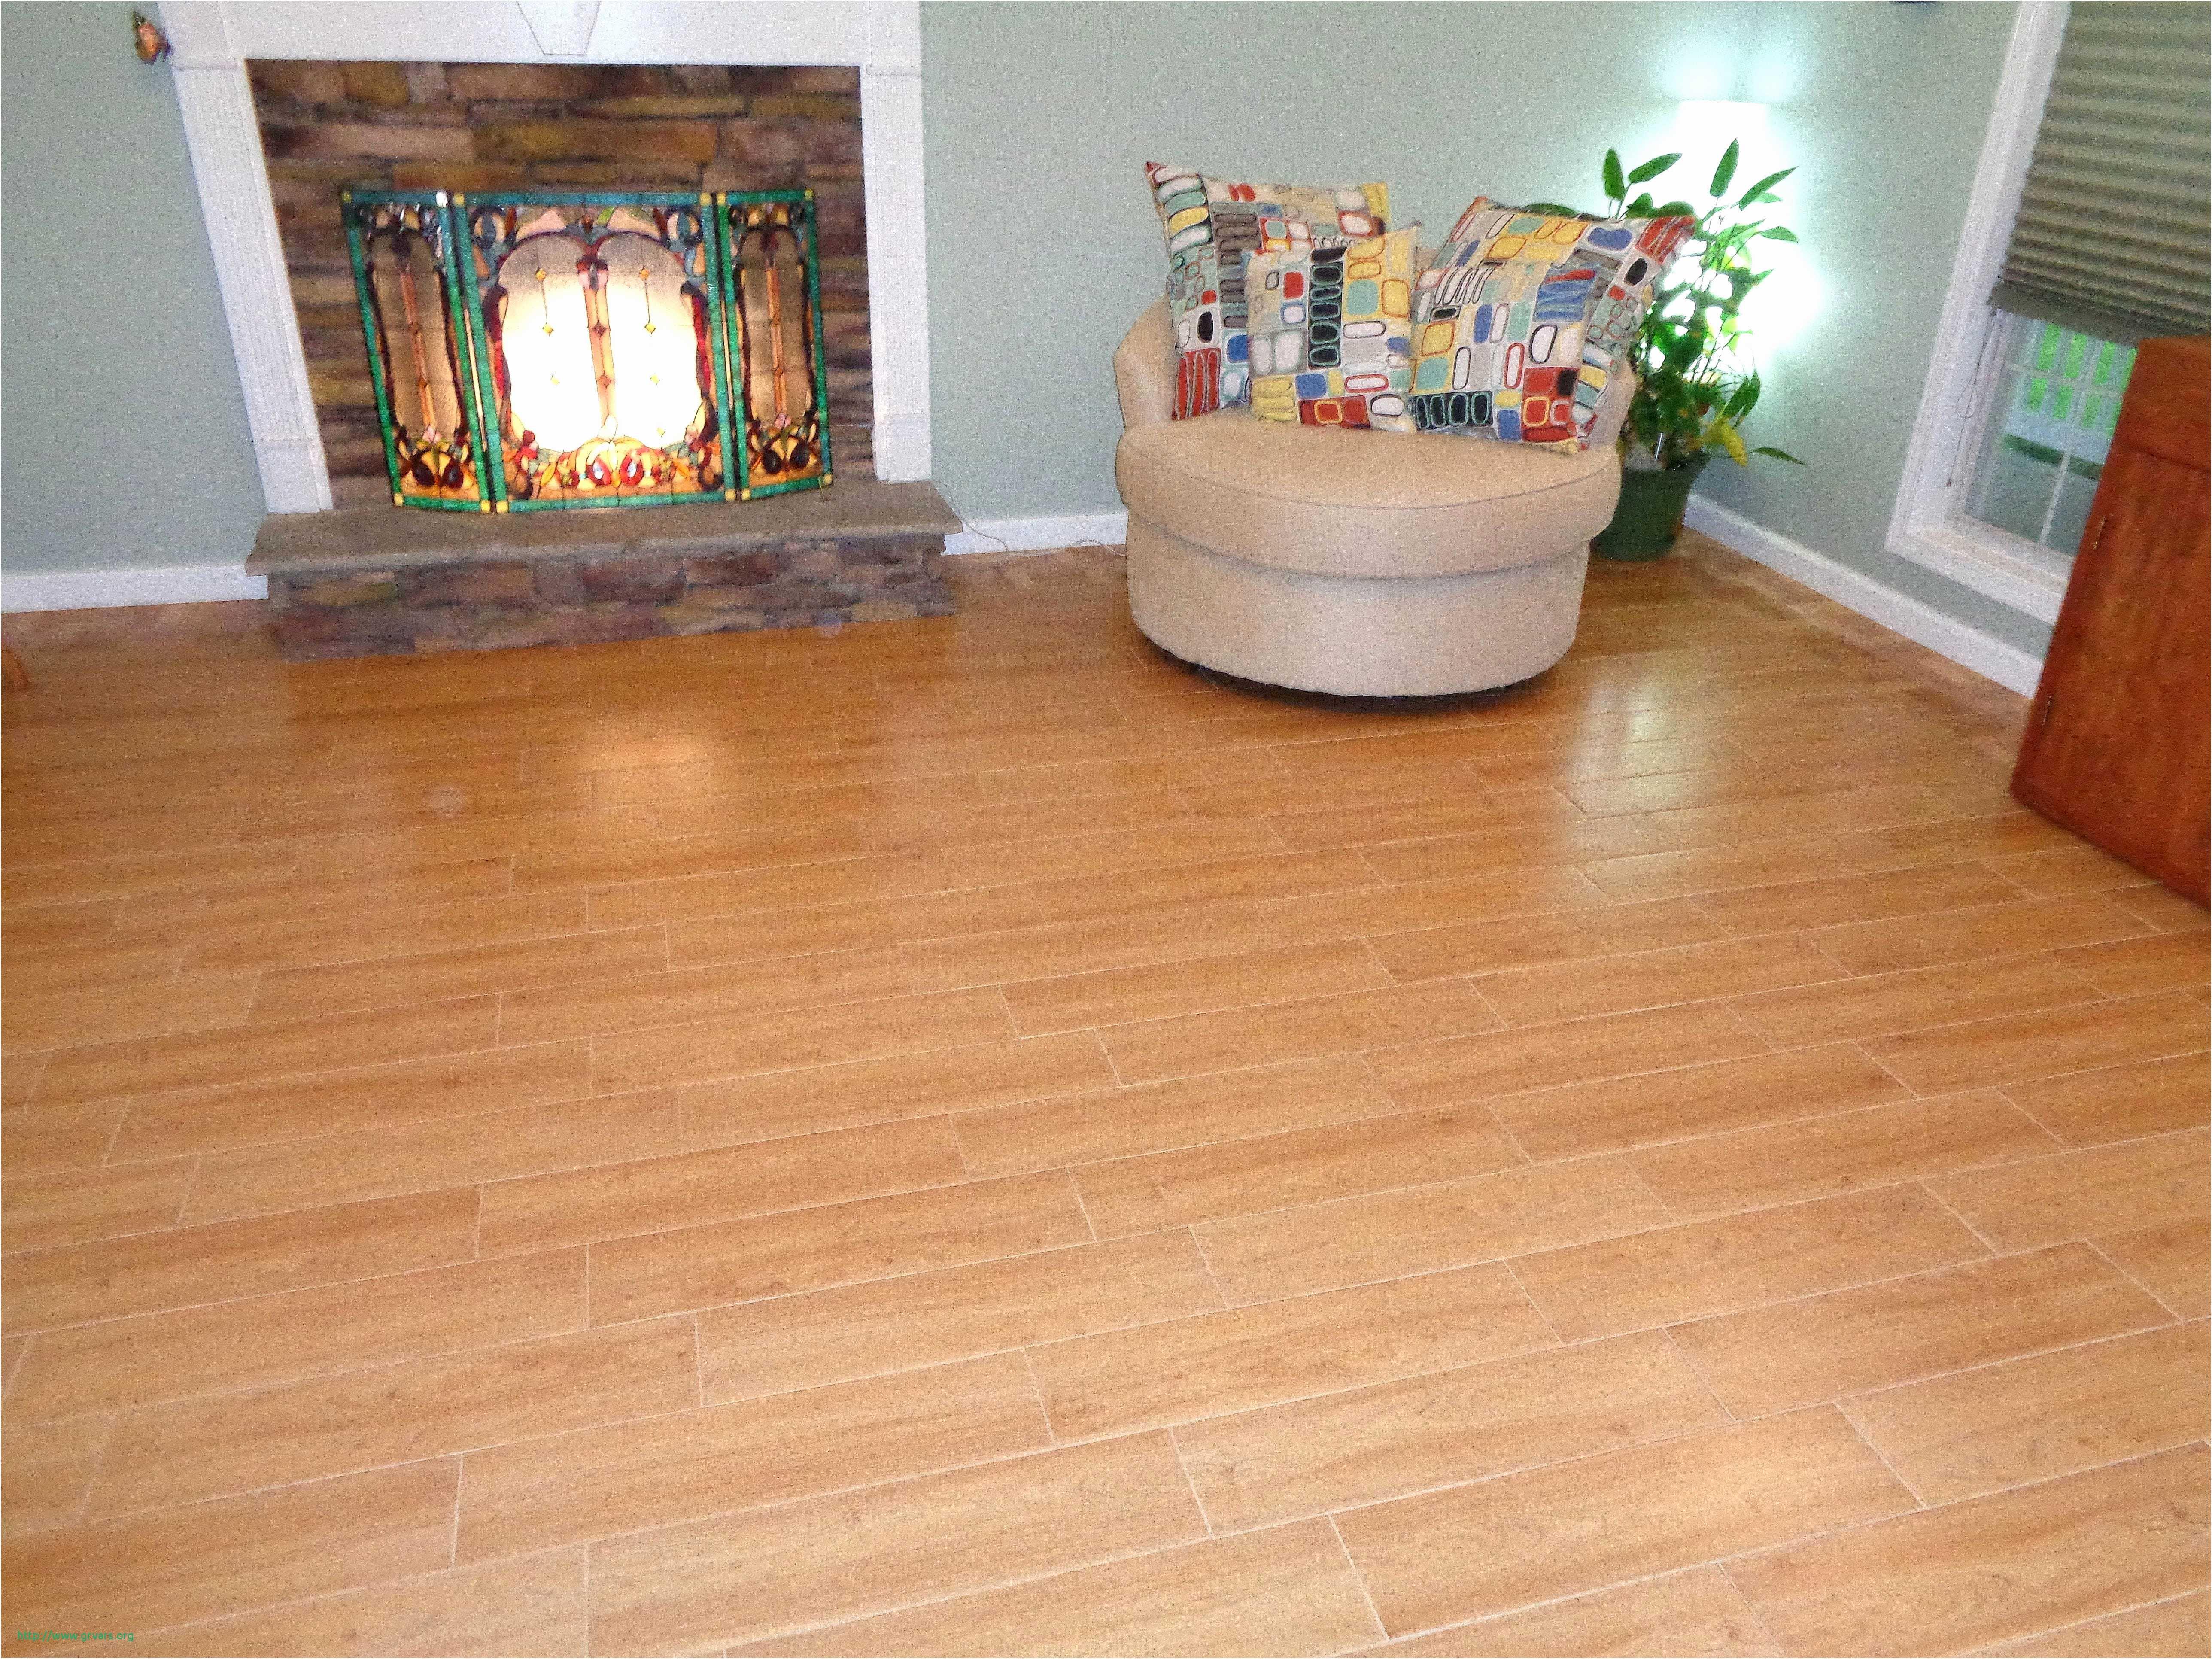 28 Fantastic Shaw White Oak Hardwood Flooring 2021 free download shaw white oak hardwood flooring of 21 inspirant best prices for laminate wood flooring ideas blog within best prices for laminate wood flooring charmant pergo flooring colors